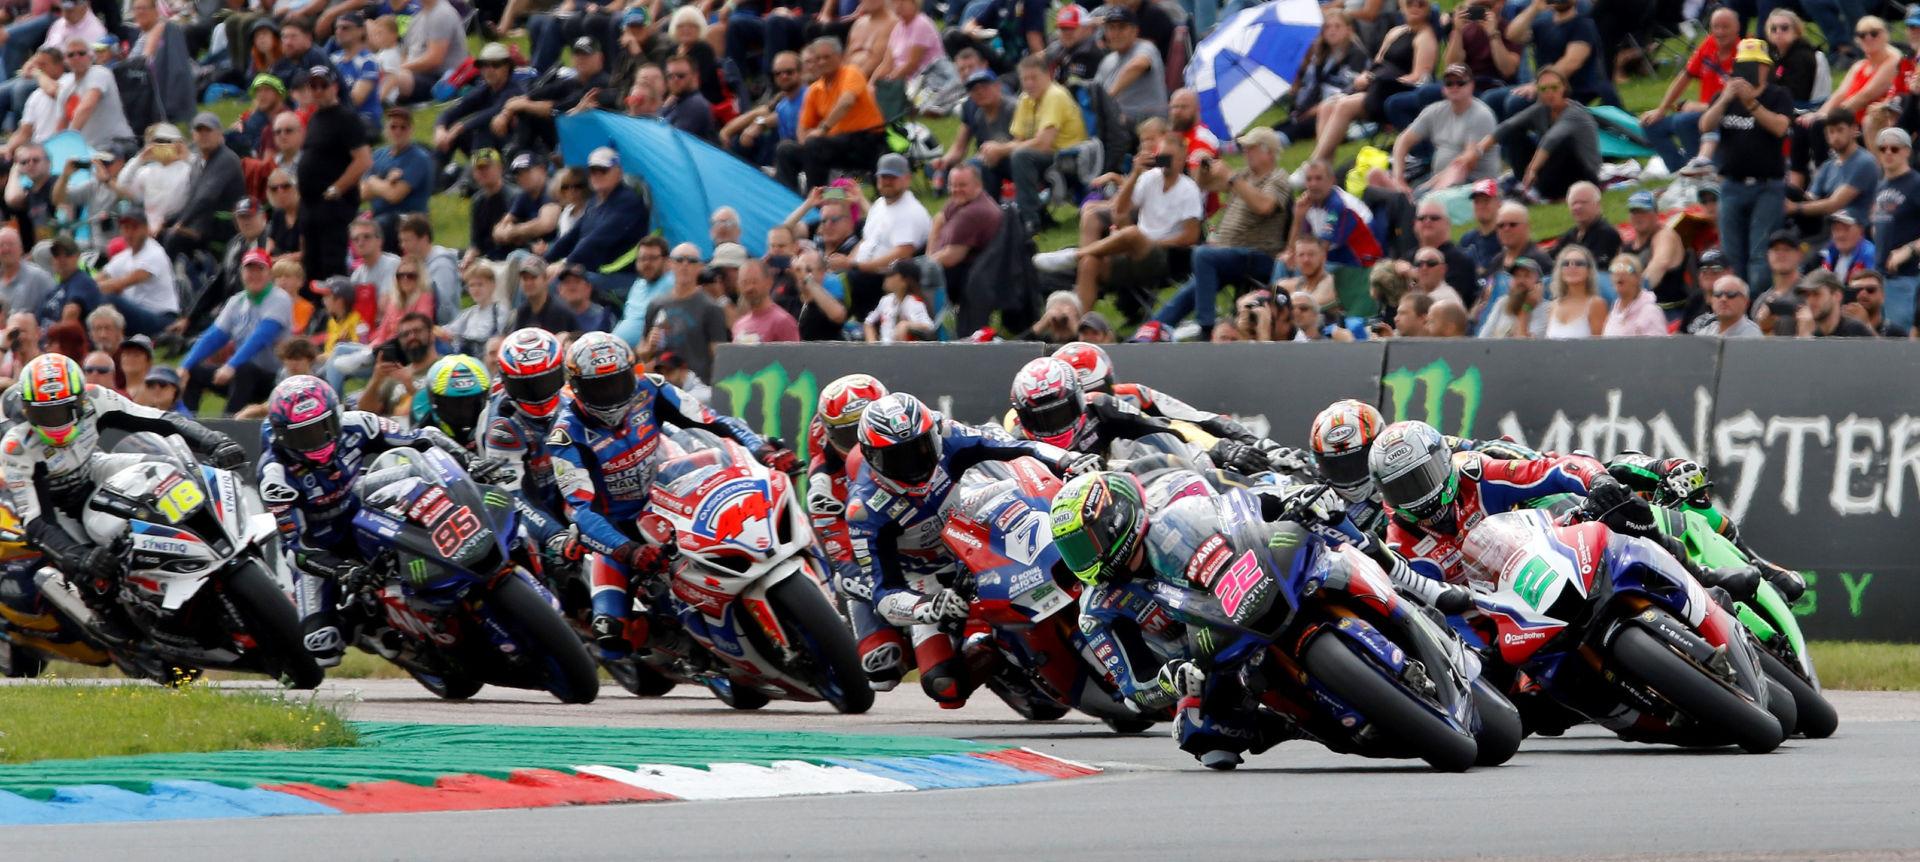 Jason O'Halloran (22) leads a British Superbike race start Sunday at Thruxton Circuit. Photo courtesy MotorSport Vision Racing.